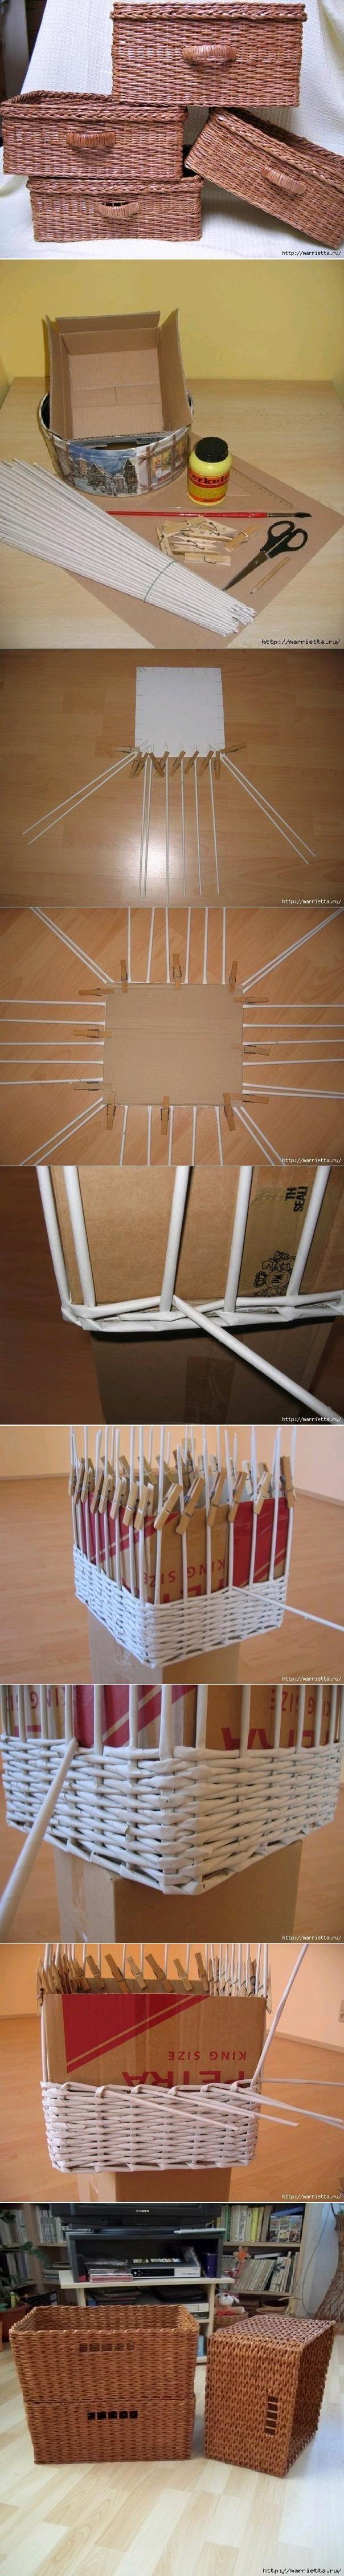 k rbe aus papier flechten basteln basteln diy schachteln und bastelideen. Black Bedroom Furniture Sets. Home Design Ideas